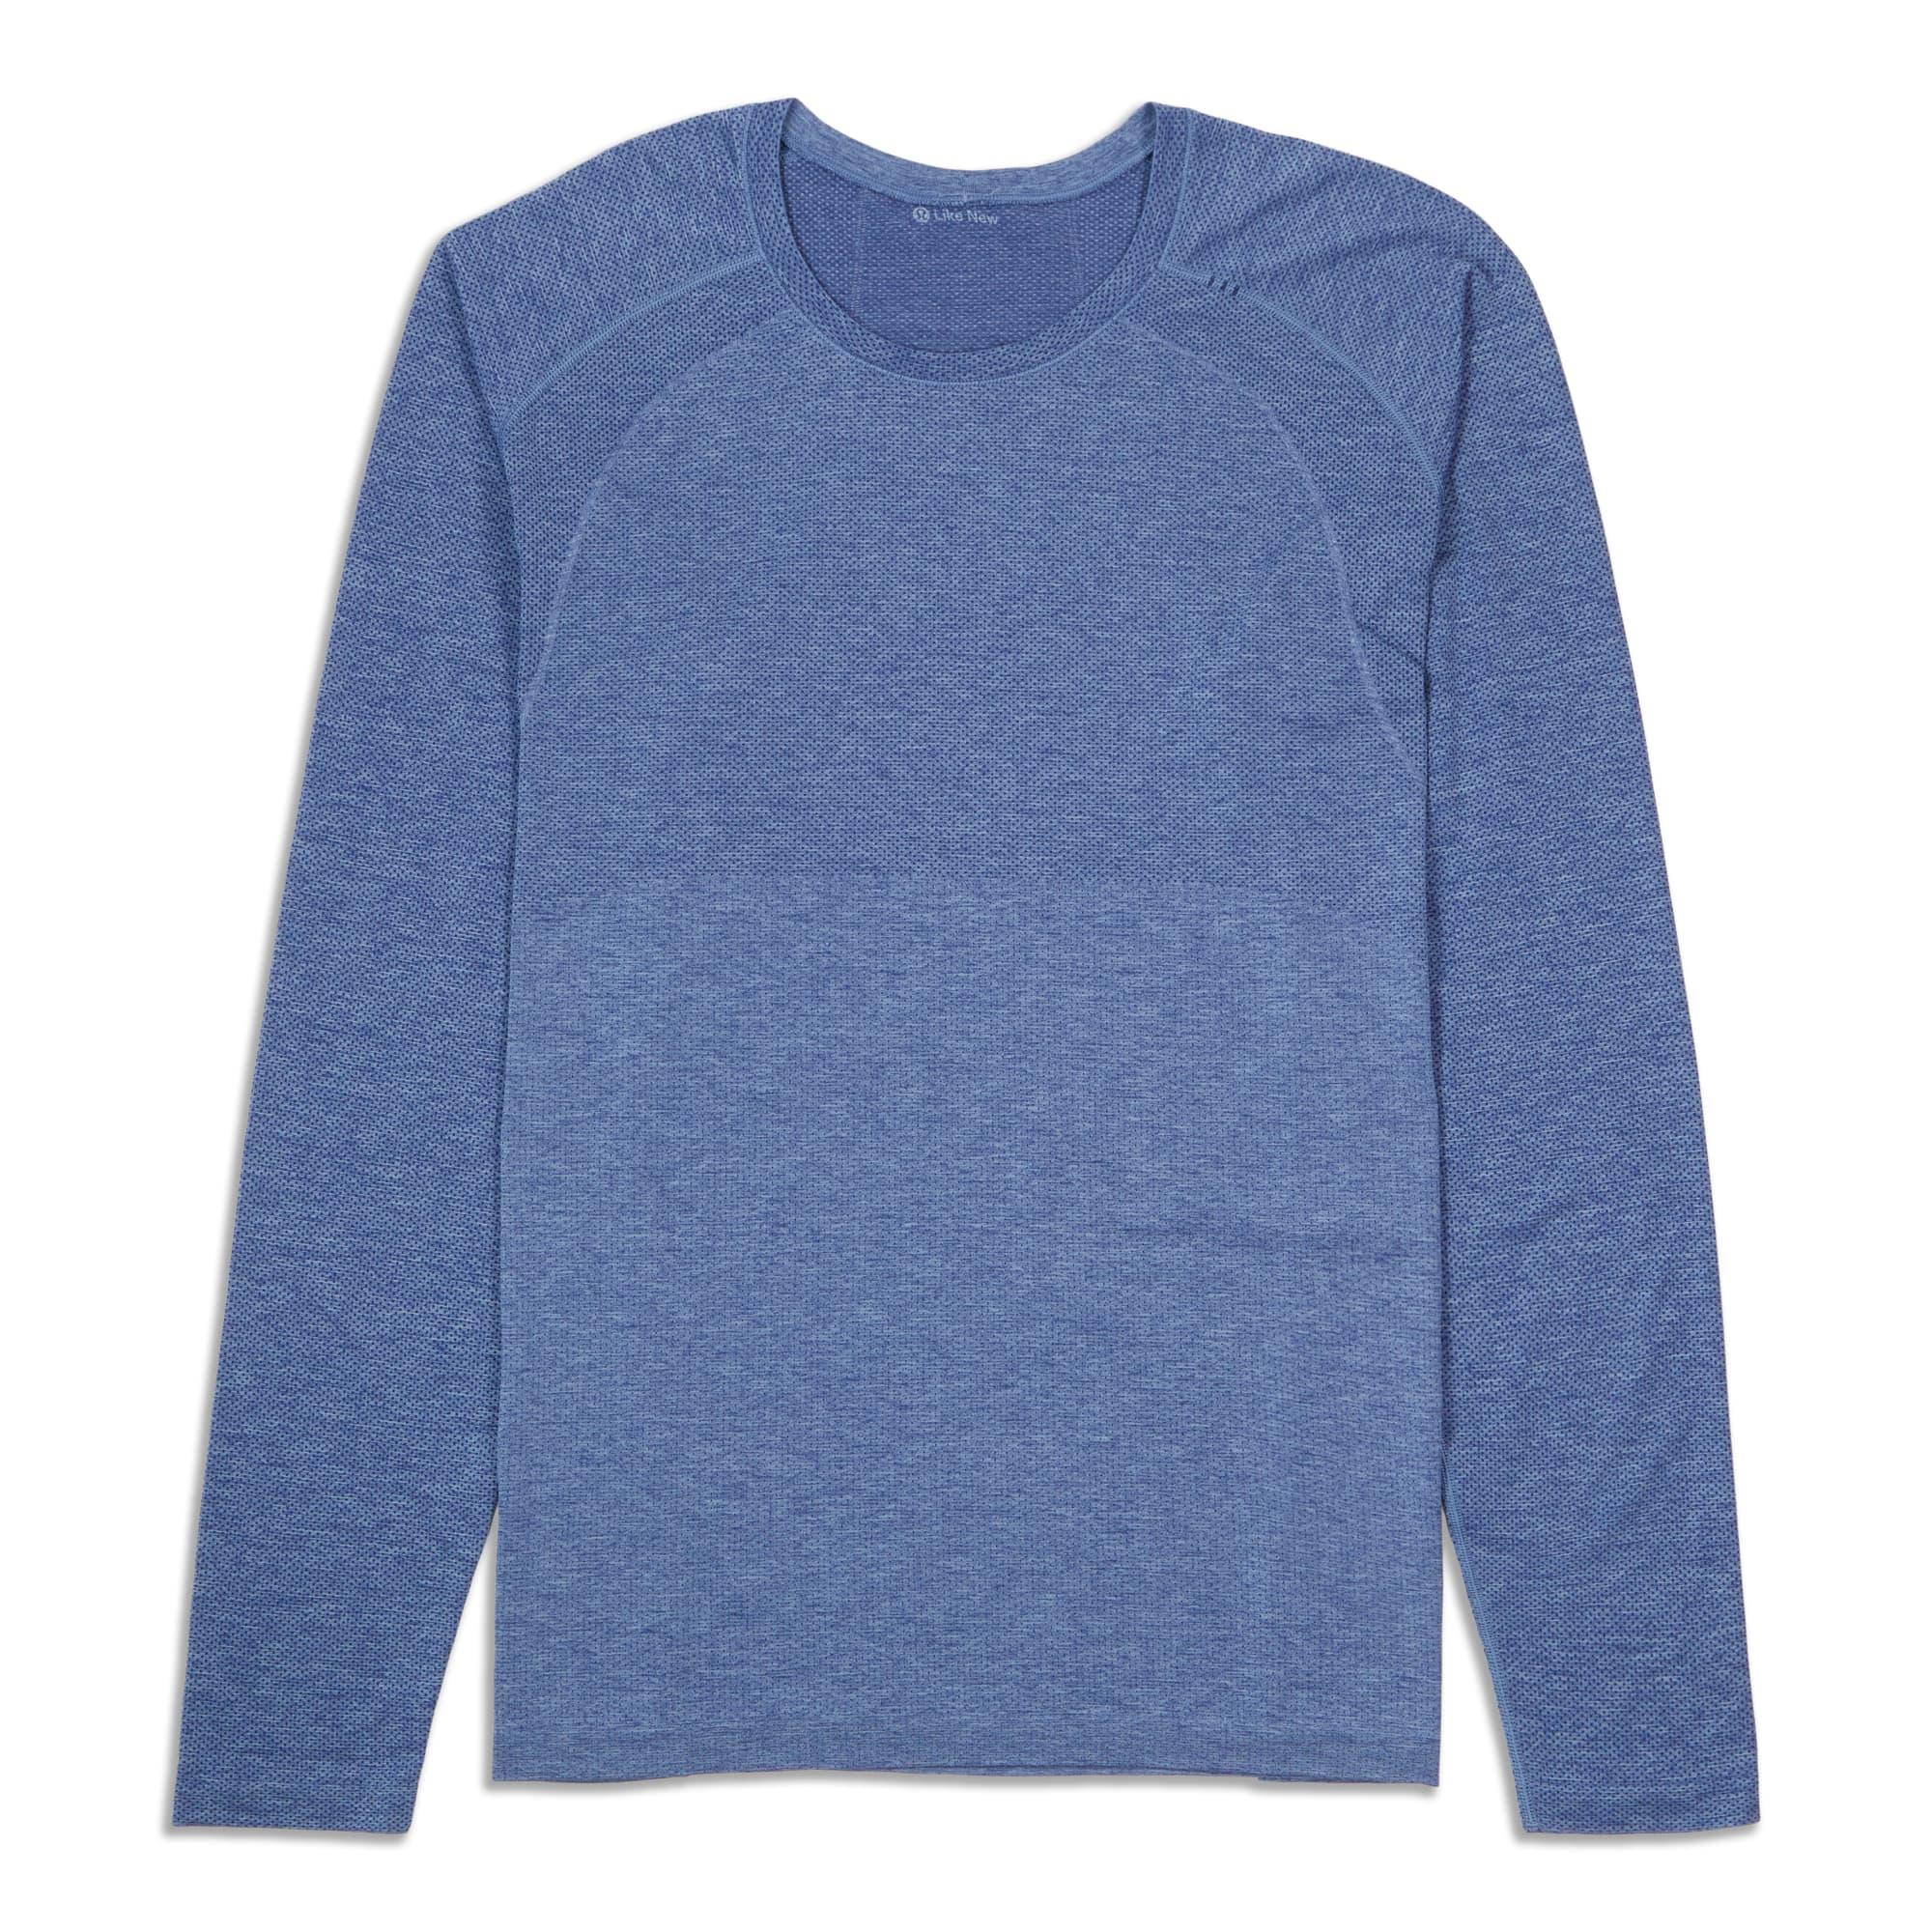 Main product image: Metal Vent Tech Long Sleeve Shirt - Resale